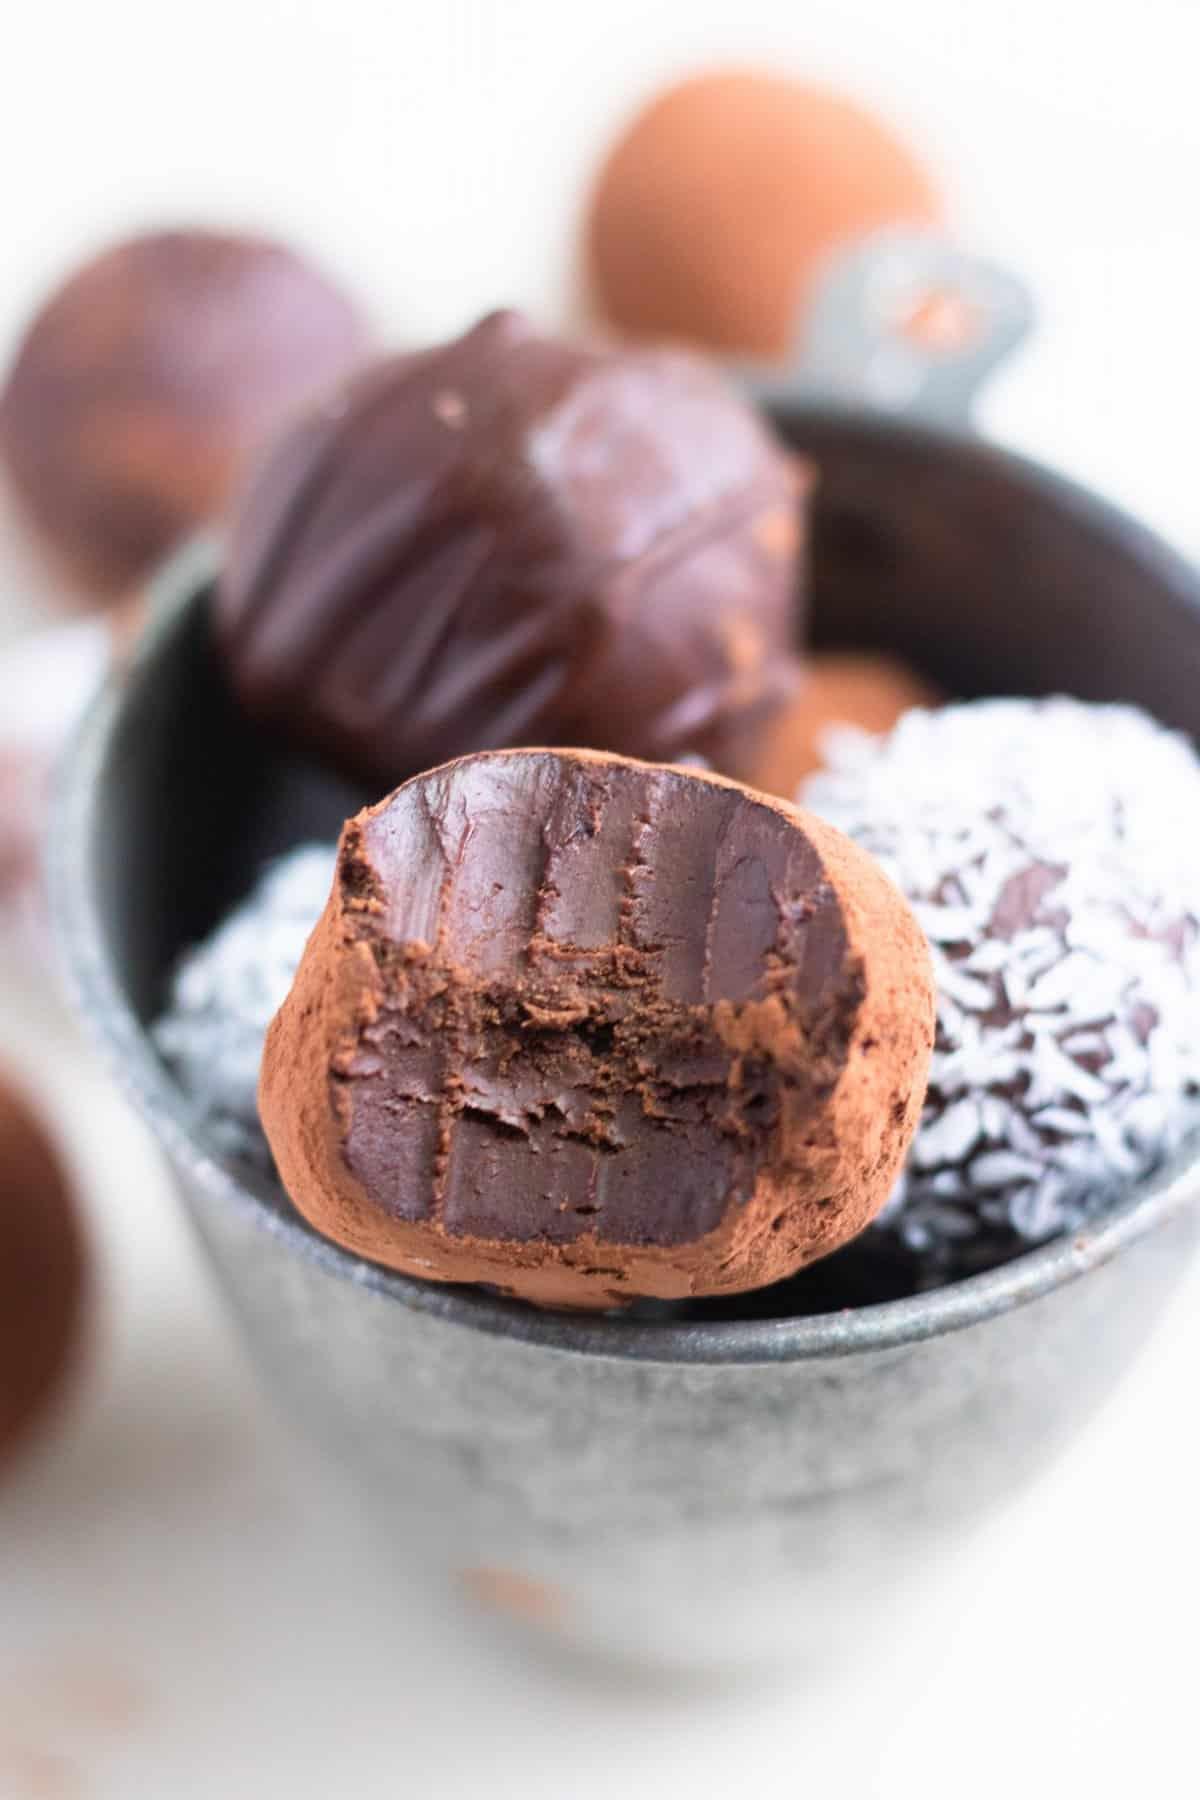 Vegan Avocado Chocolate Truffles